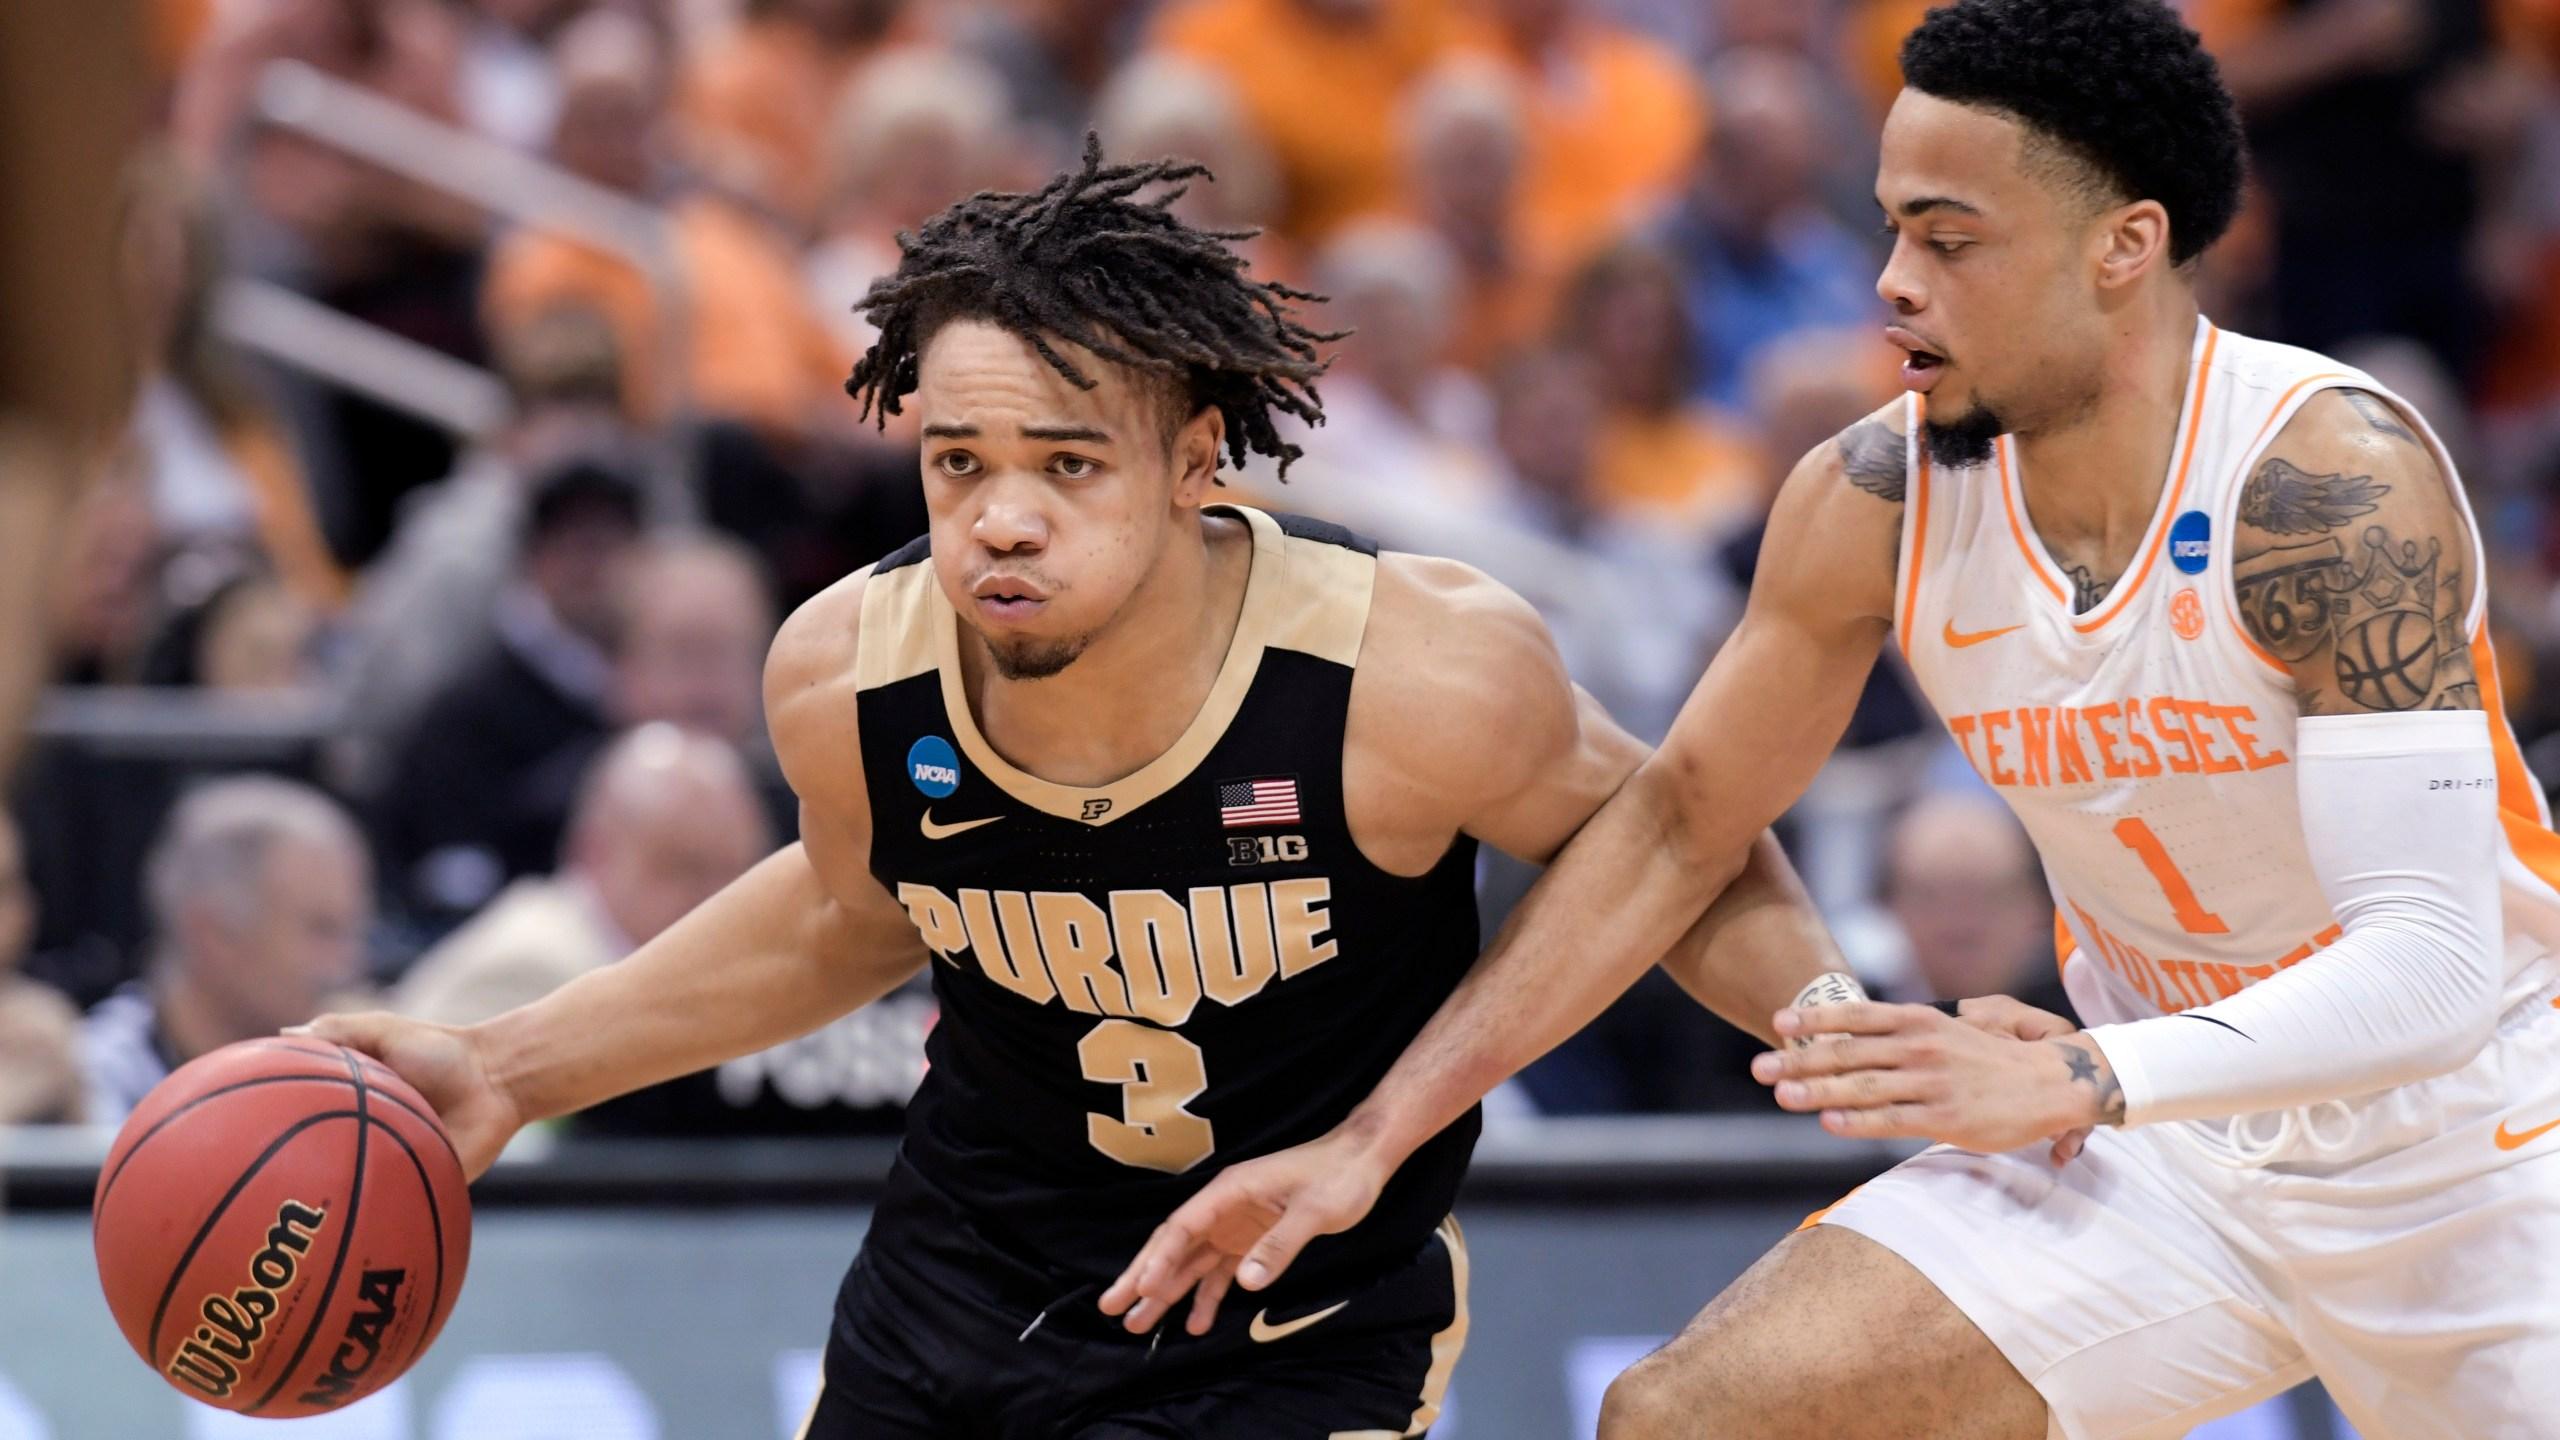 NCAA Purdue Tennessee Basketball_1553824883873